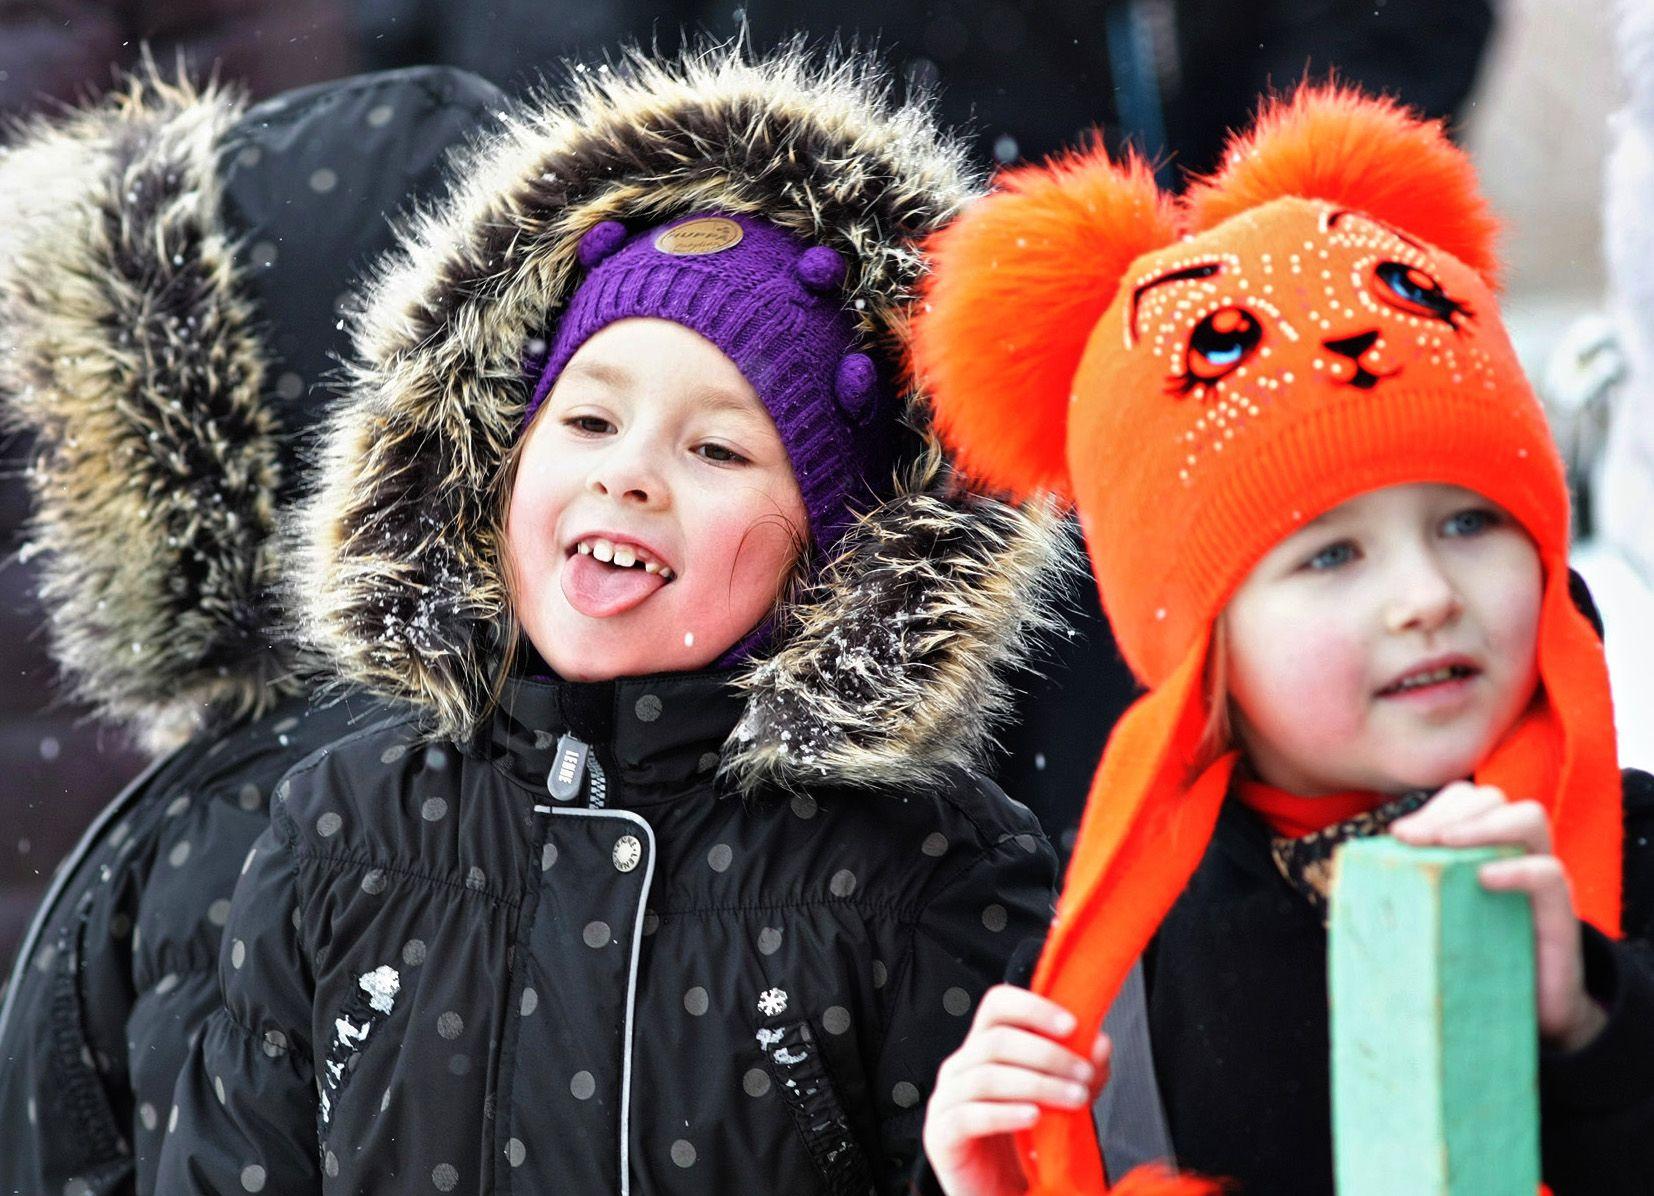 Зимний аттракцион: поймай снежинку на язык!